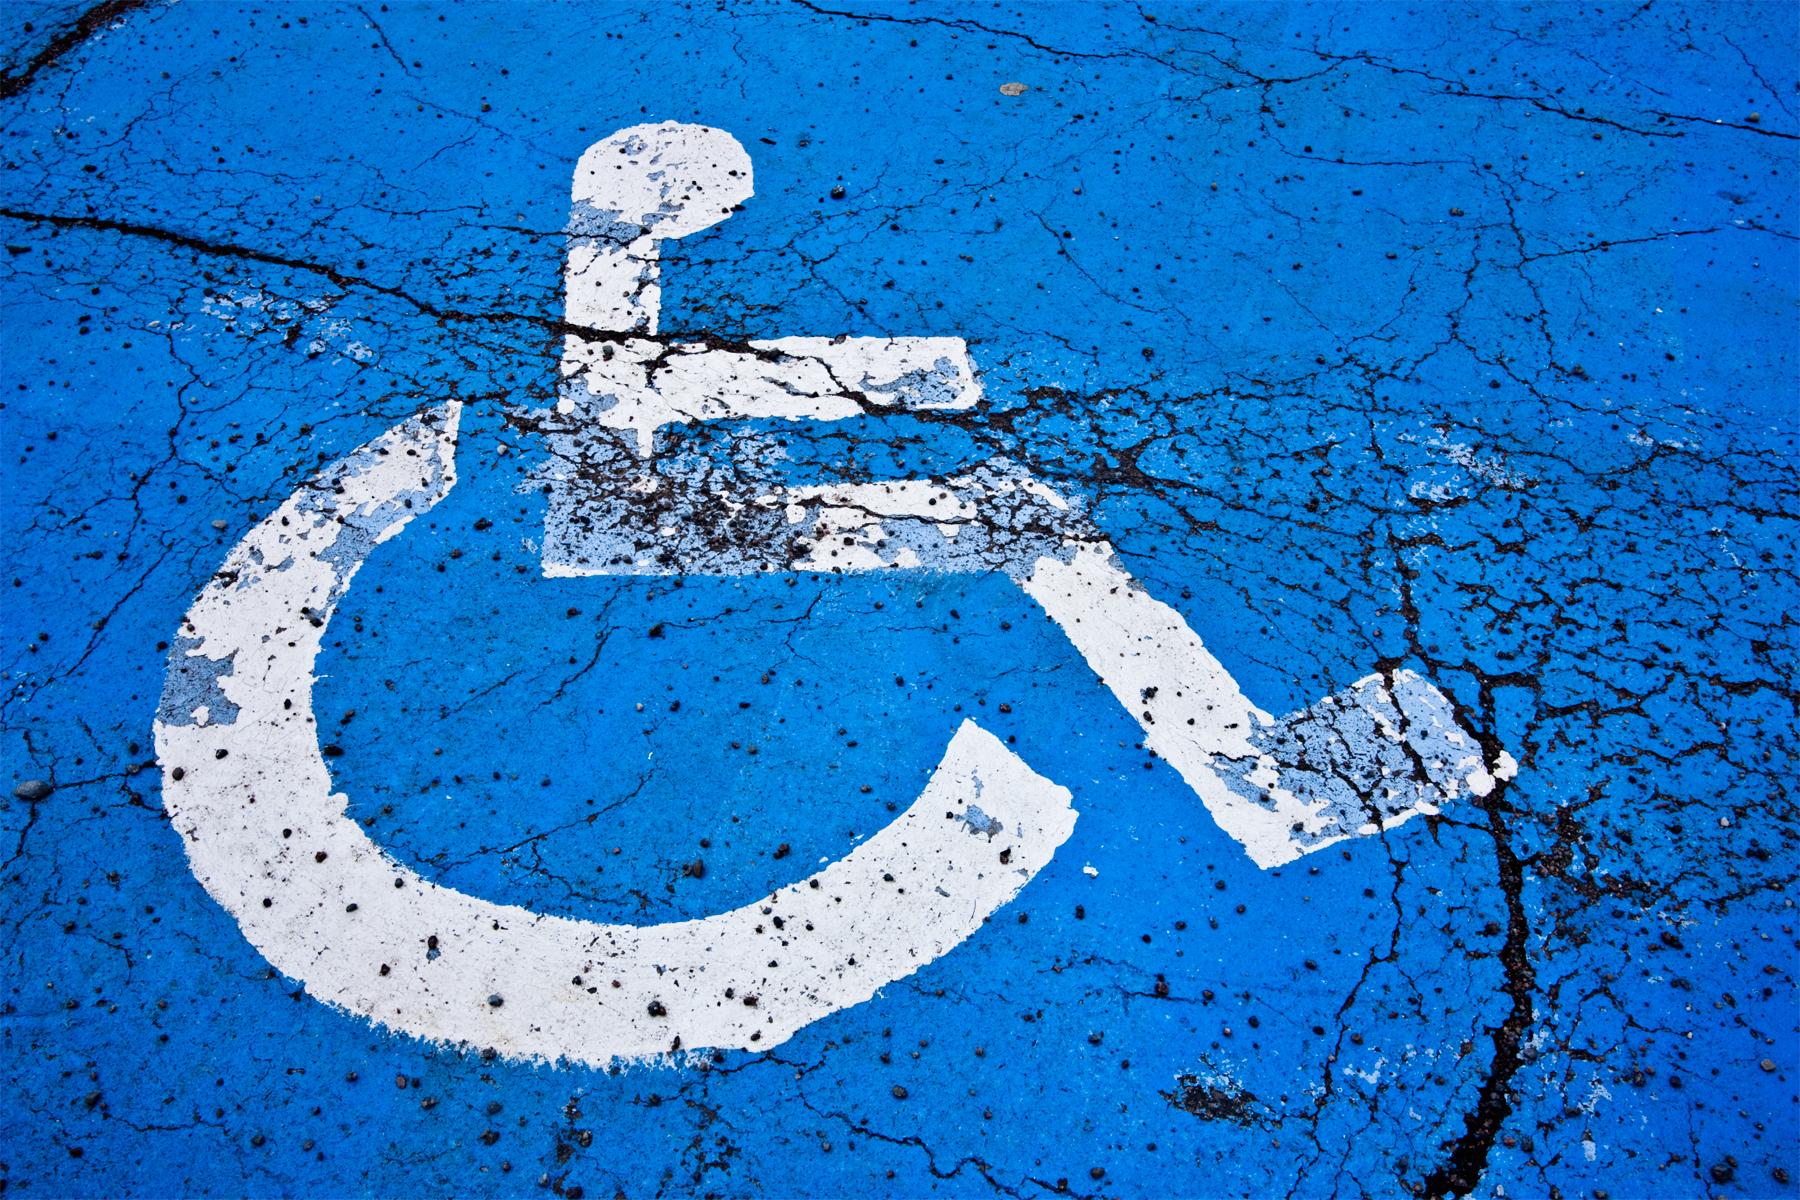 Cracked handicap sign photo